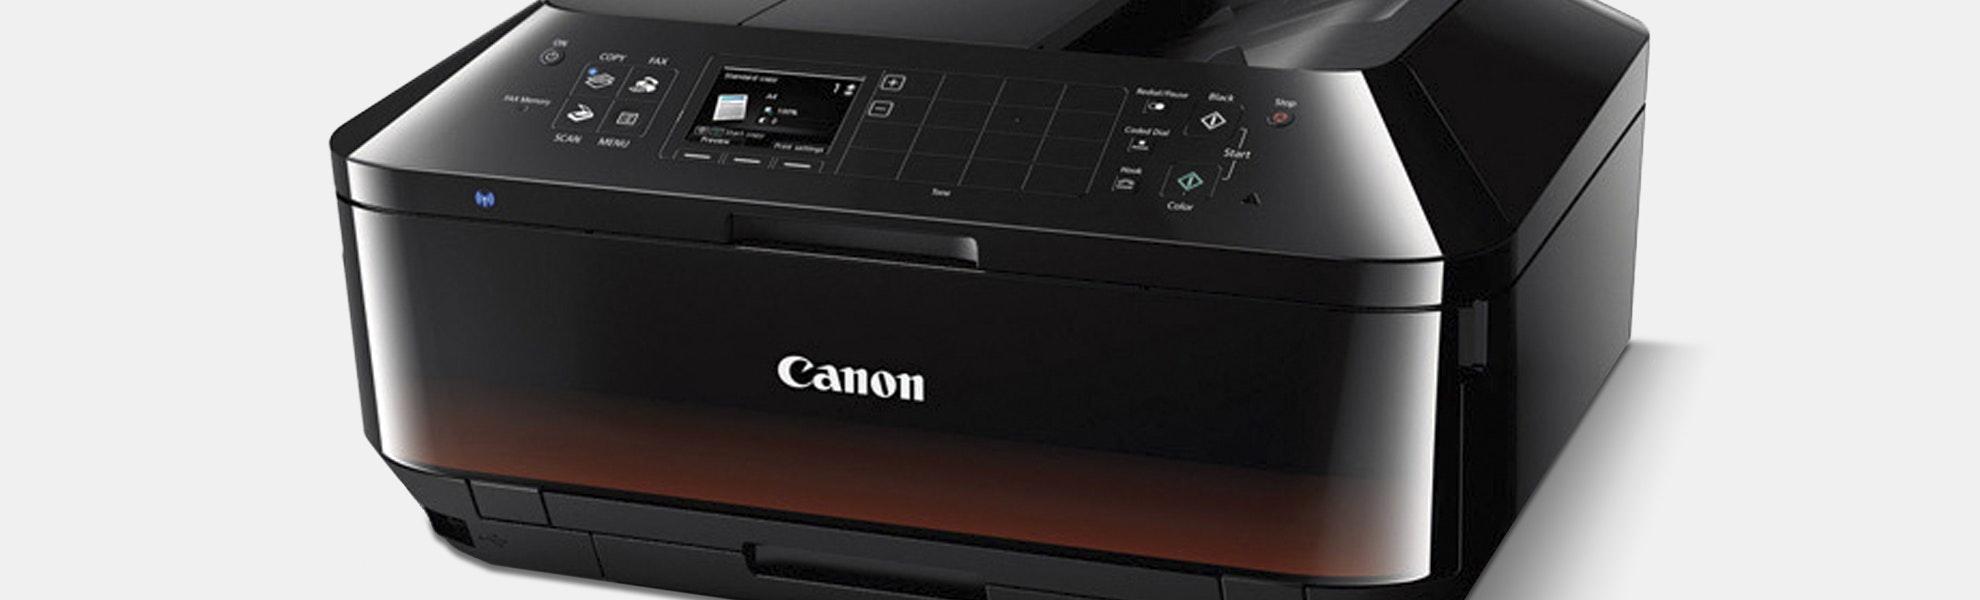 Canon PIXMA MX922 Wireless/Mobile All In One